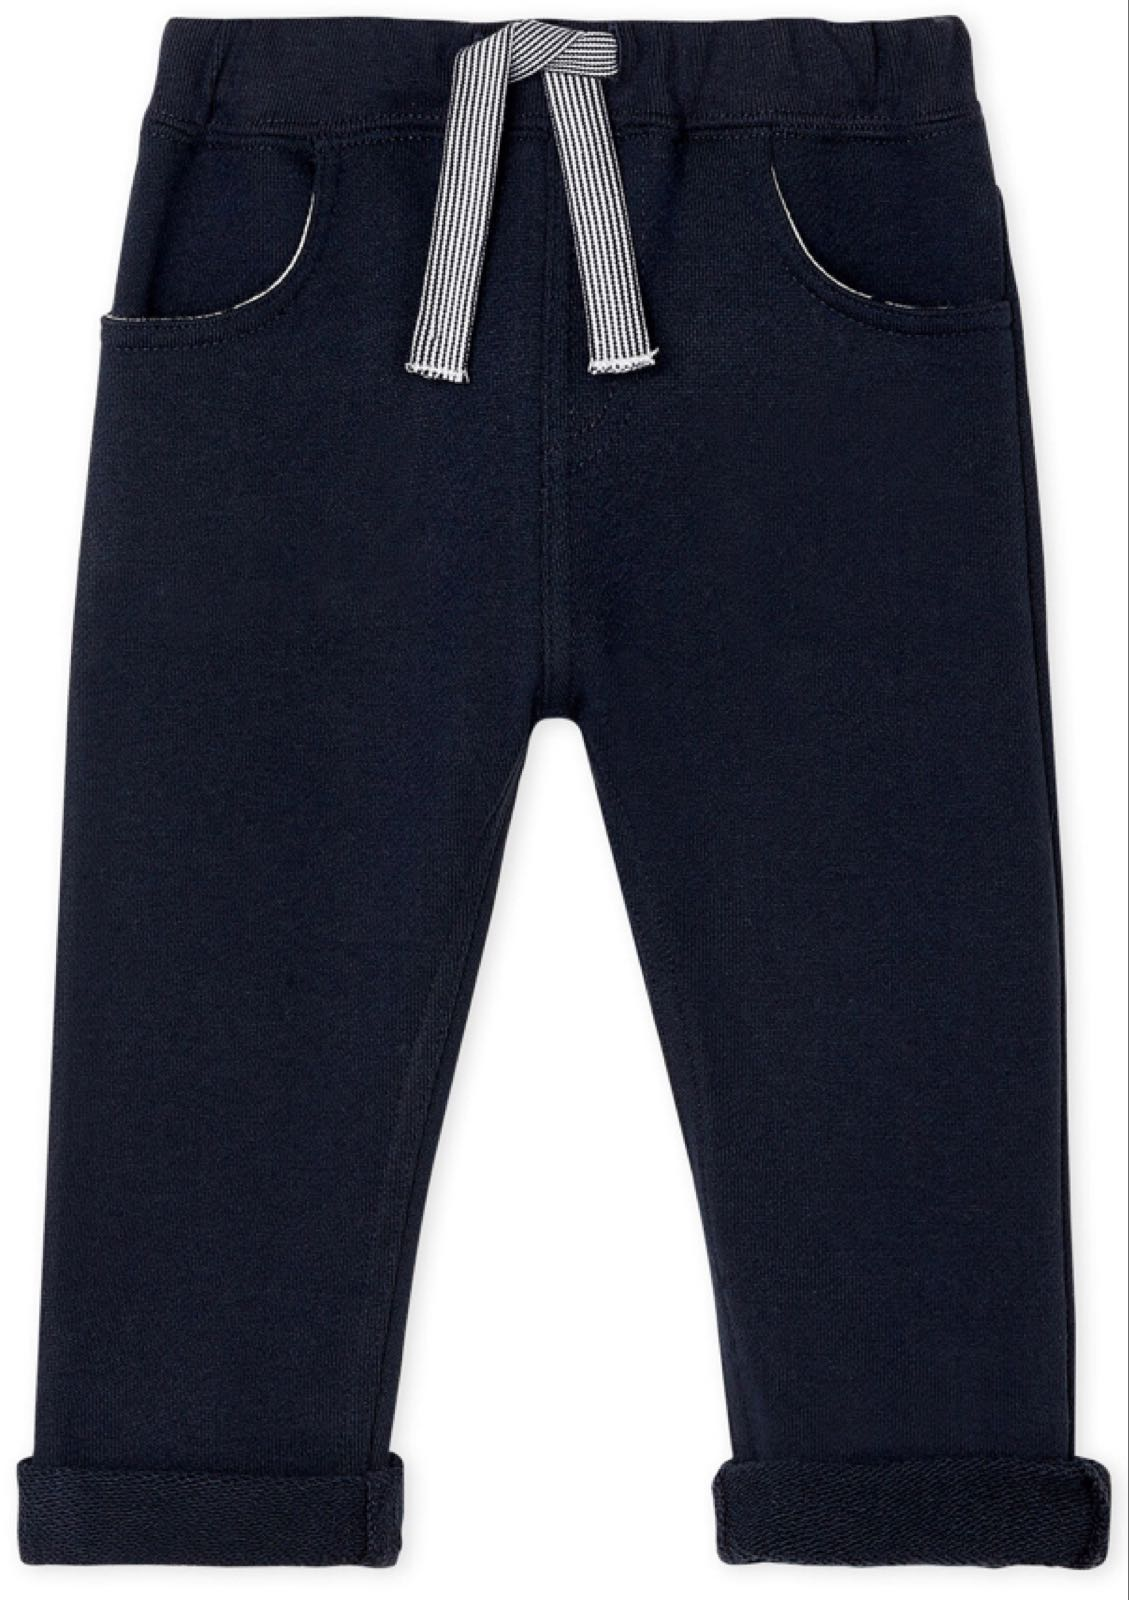 Petit Bateau Baby Boys' Plain Fleece Navy Trousers